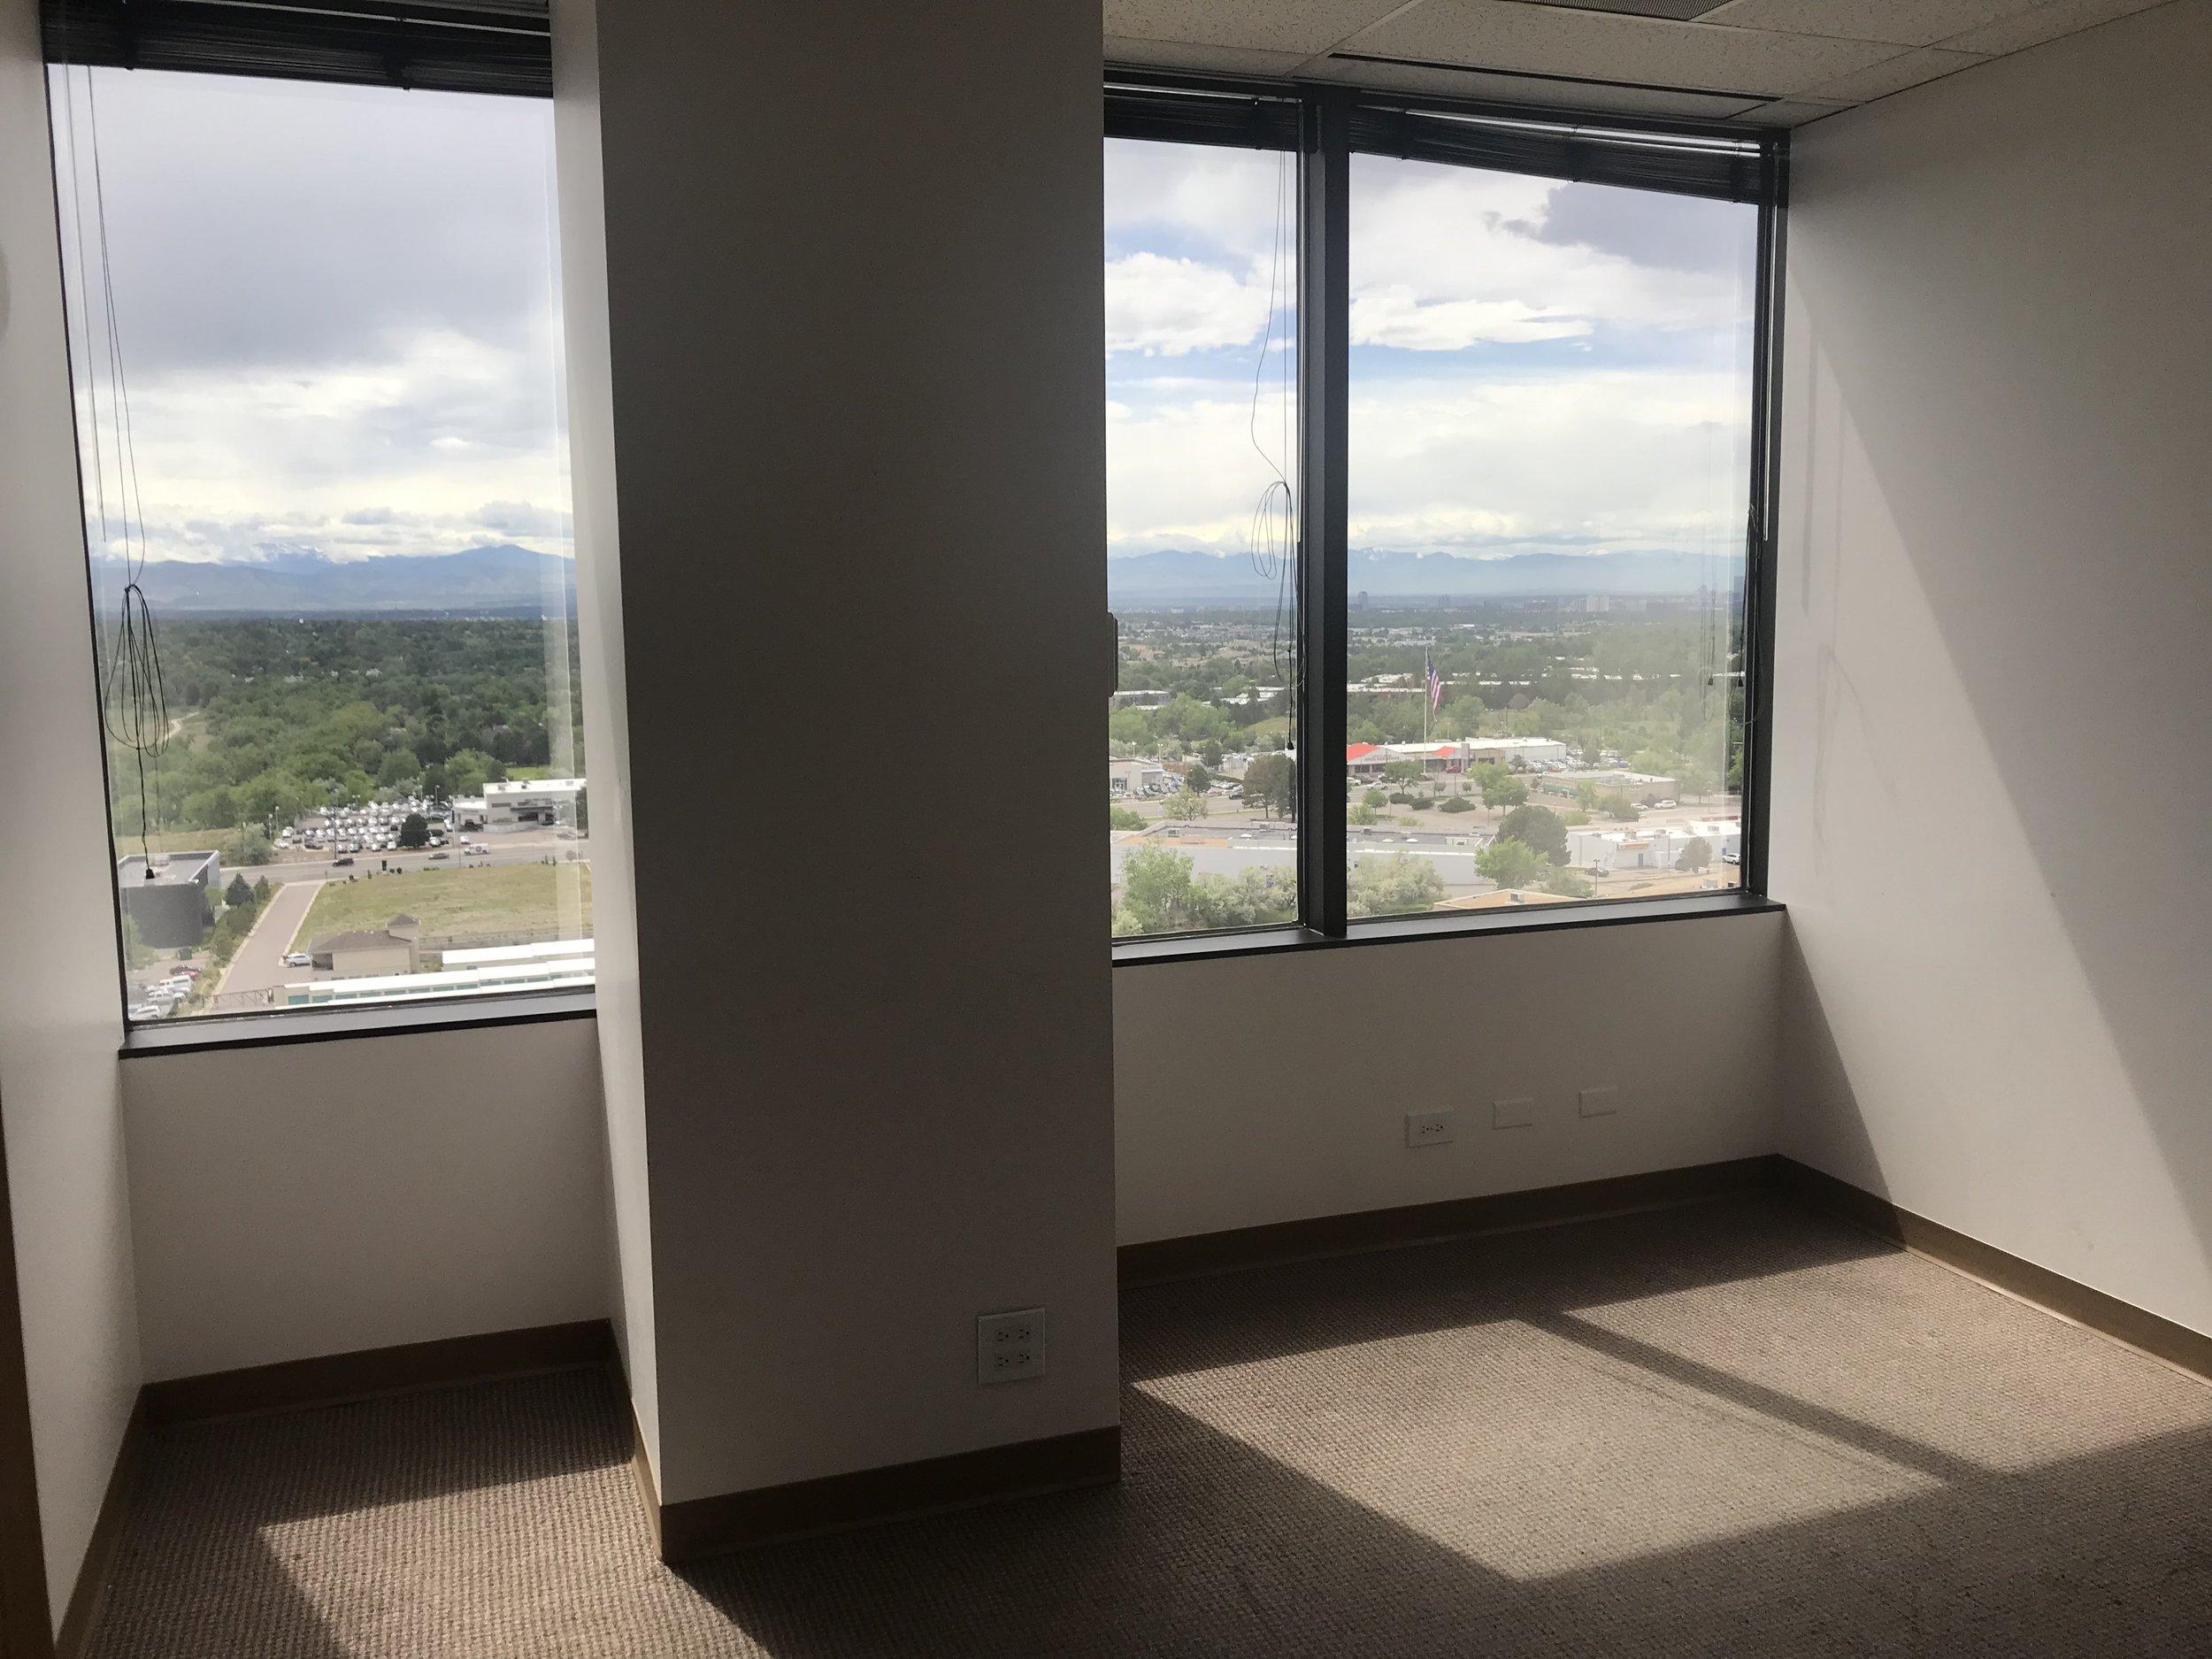 Office F — Western Views, Adjacent to Kitchen